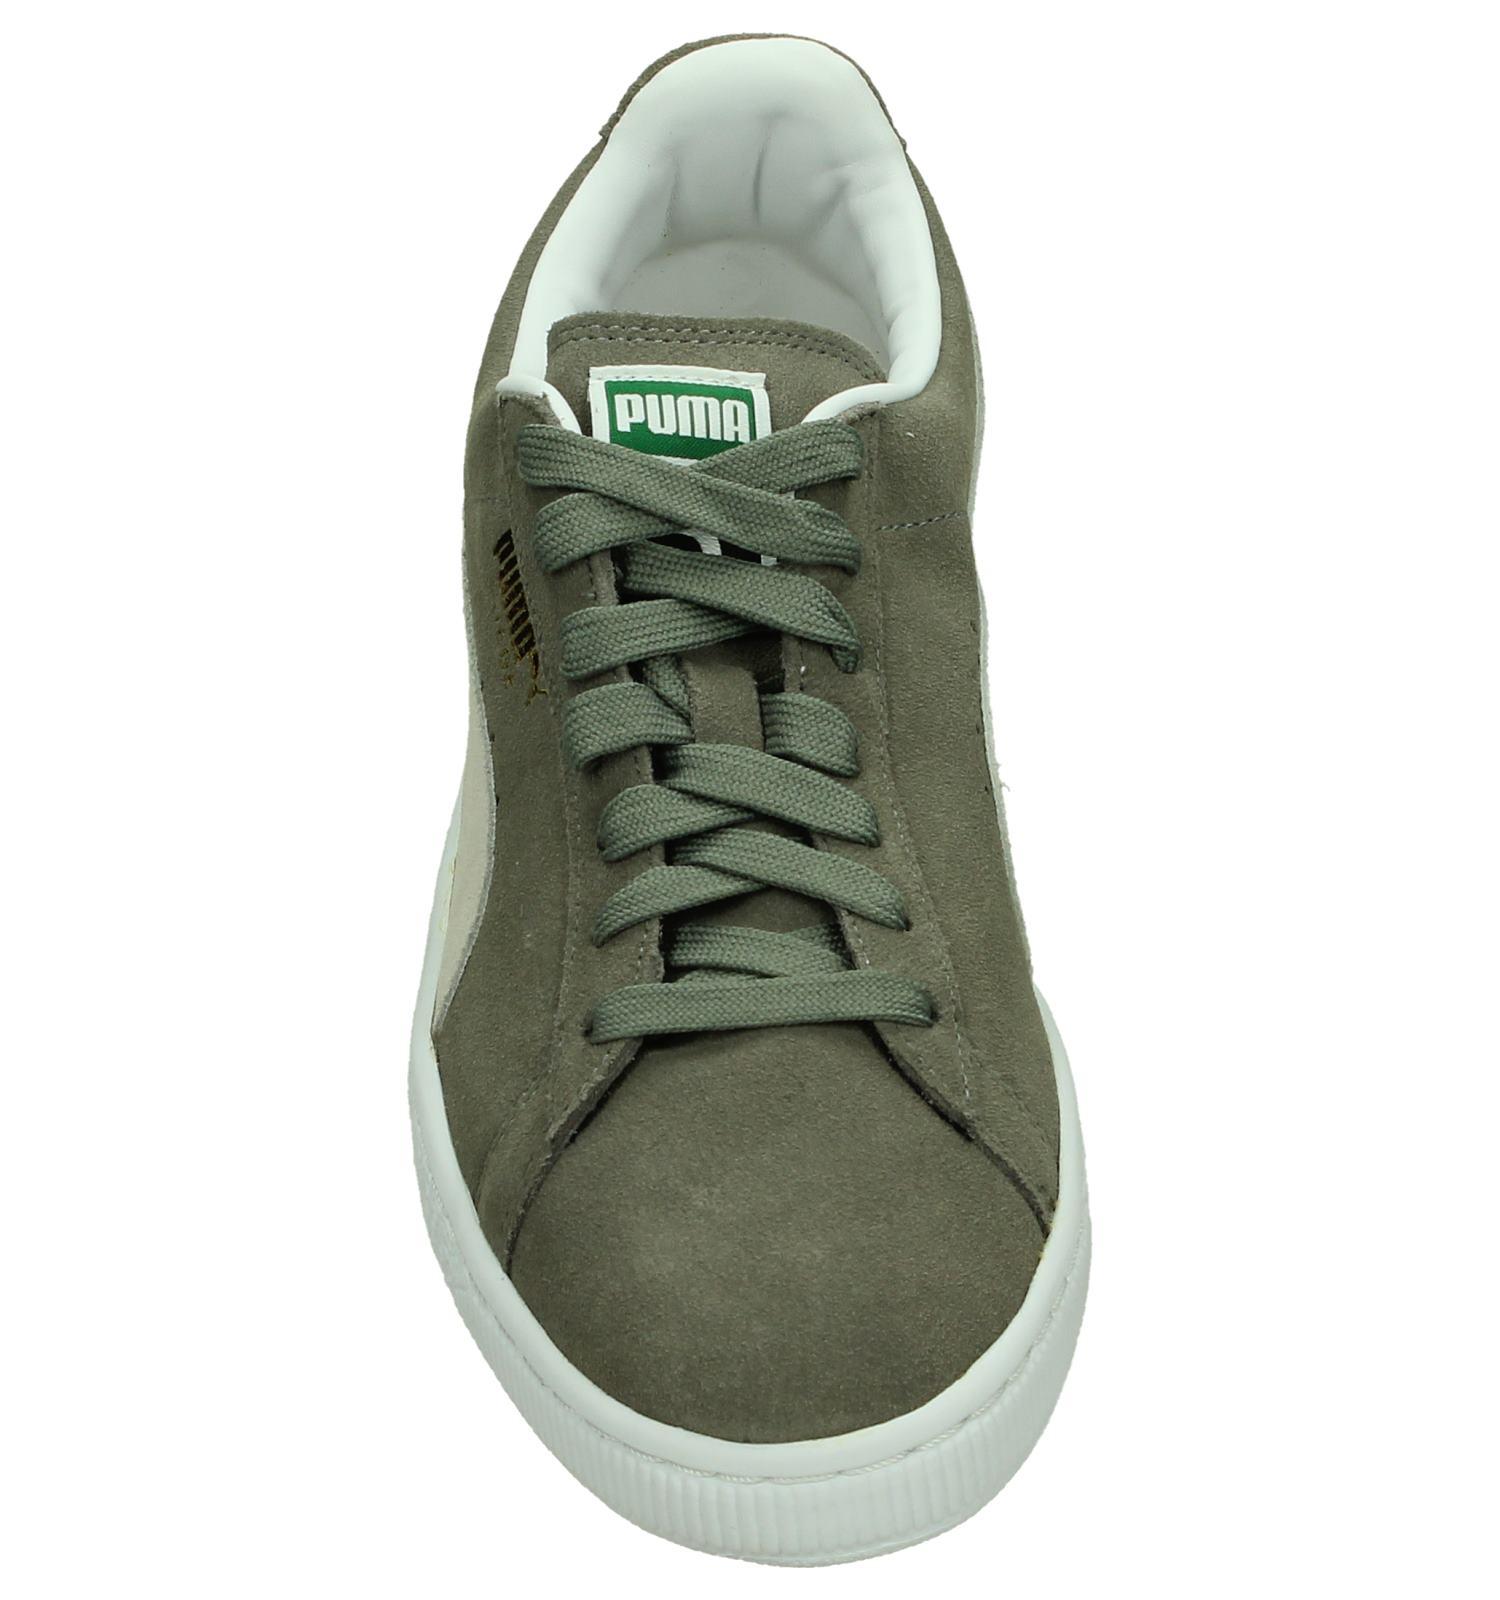 45b869034c3 Grijze Sneakers Puma Suede Classic | TORFS.BE | Gratis verzend en retour